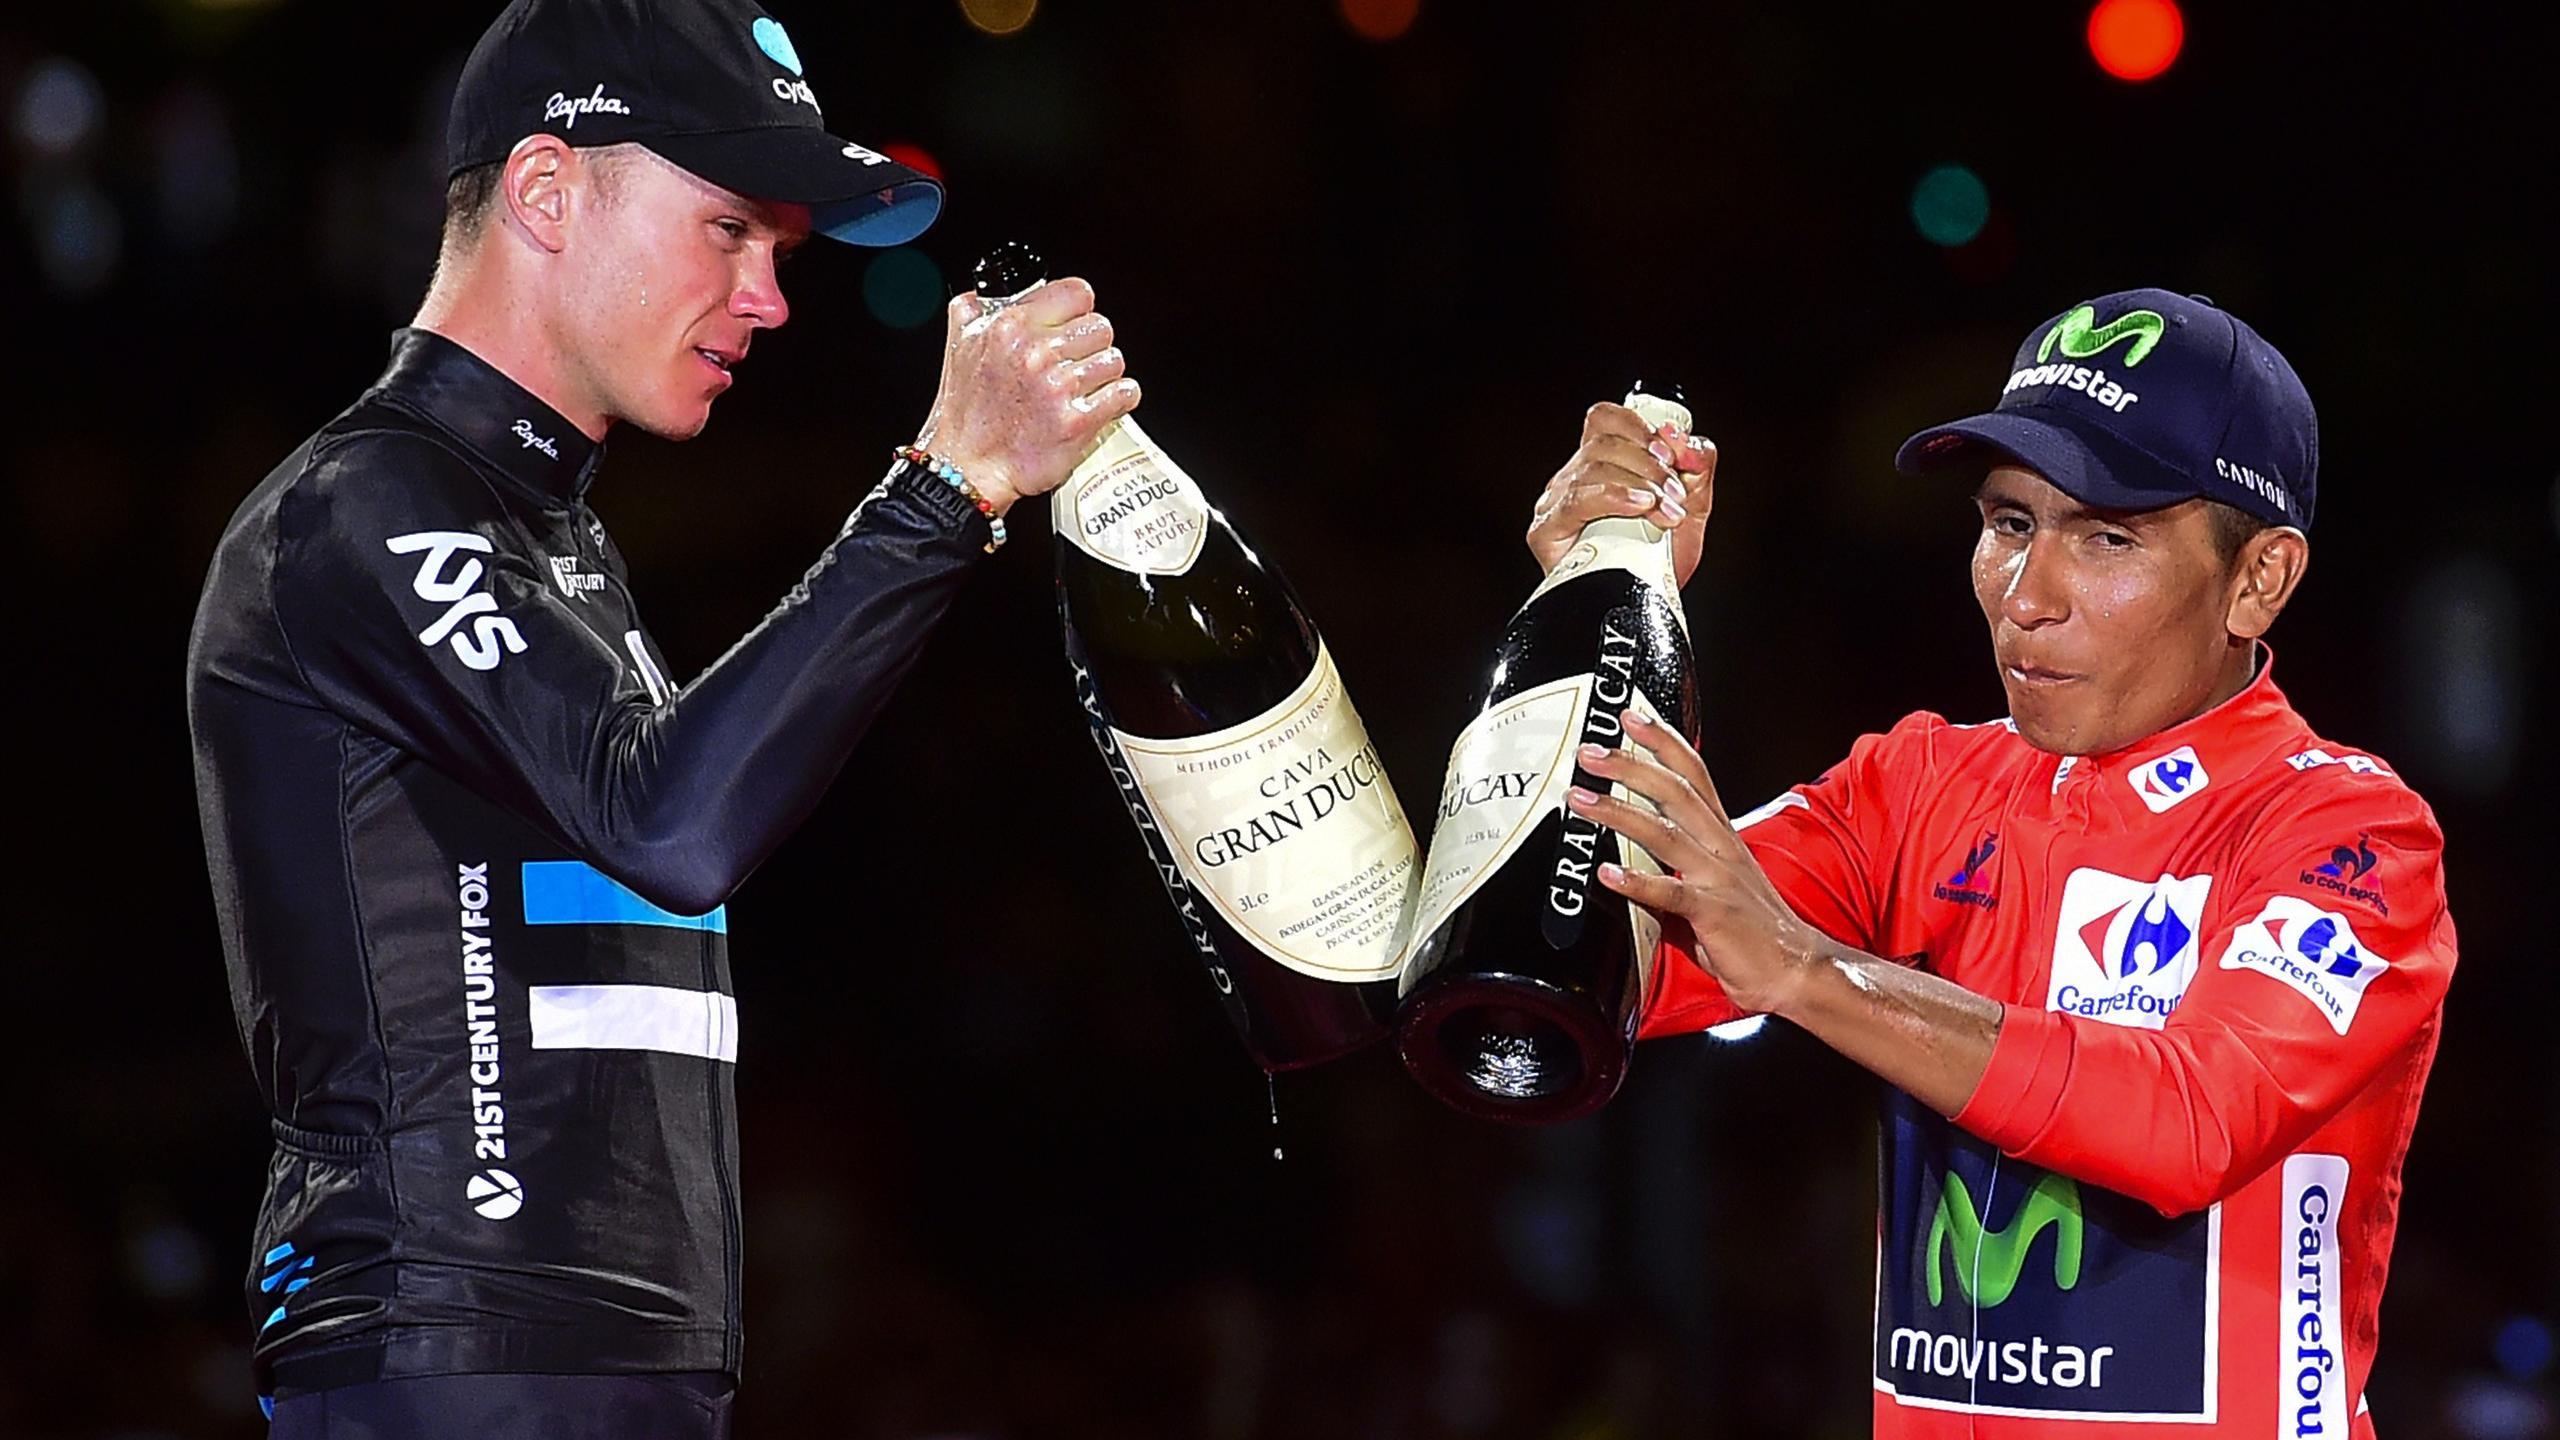 Nairo Quintana and Chris Froome atop the podium